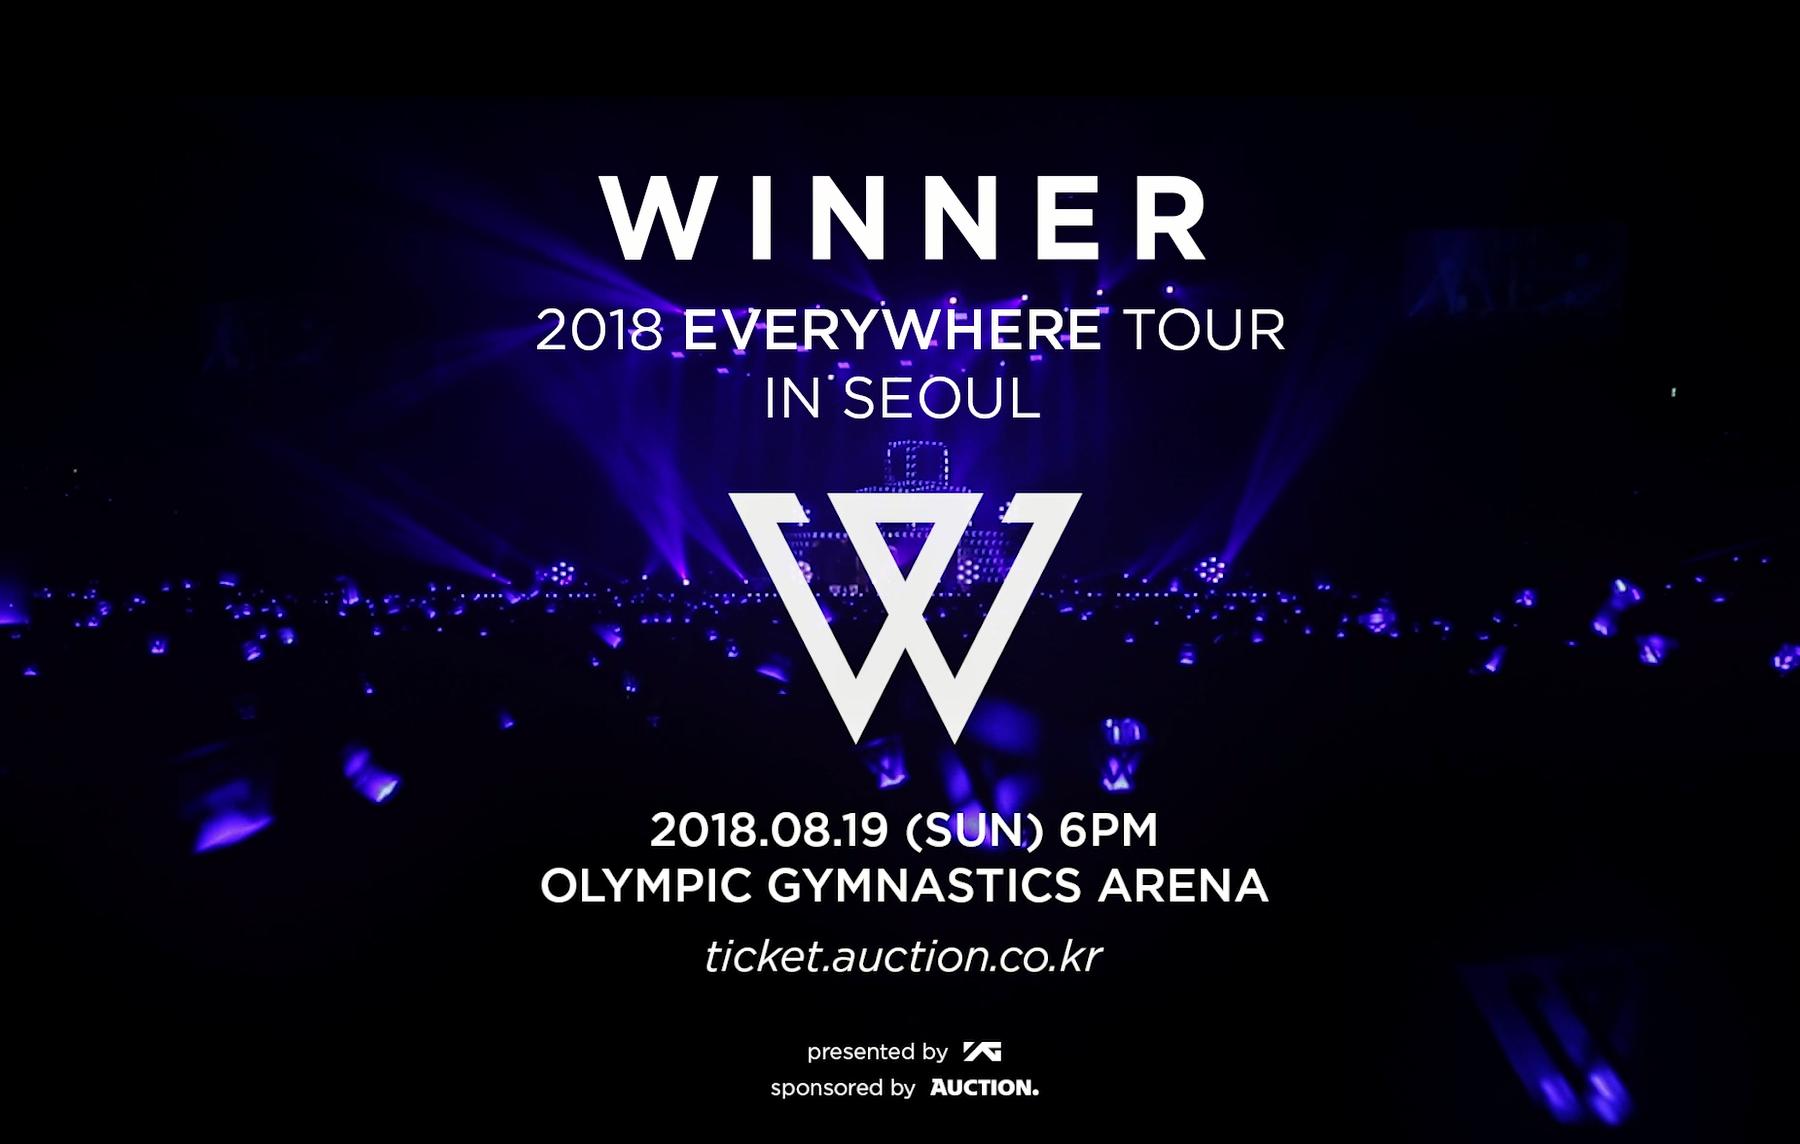 WINNER - 'EVERYWHERE TOUR' TEASER